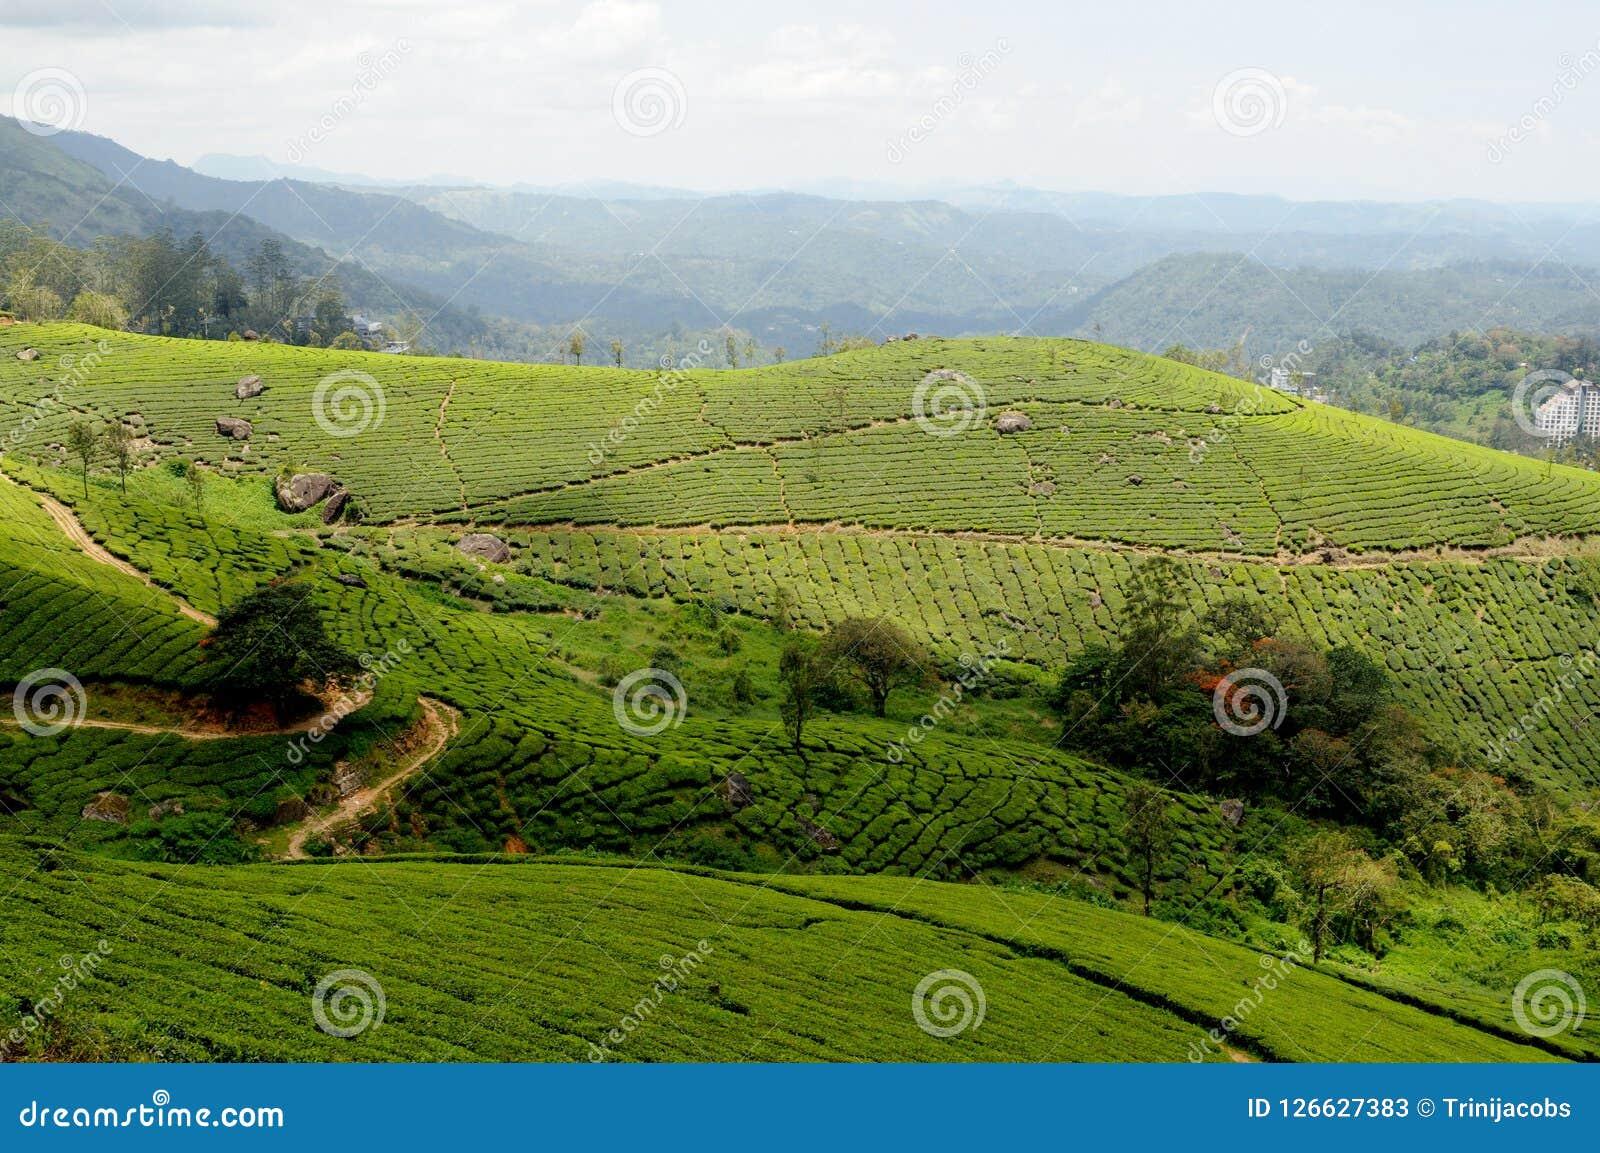 Pullivasal Tea Estate In Munnar, Kerala State, India Stock ...